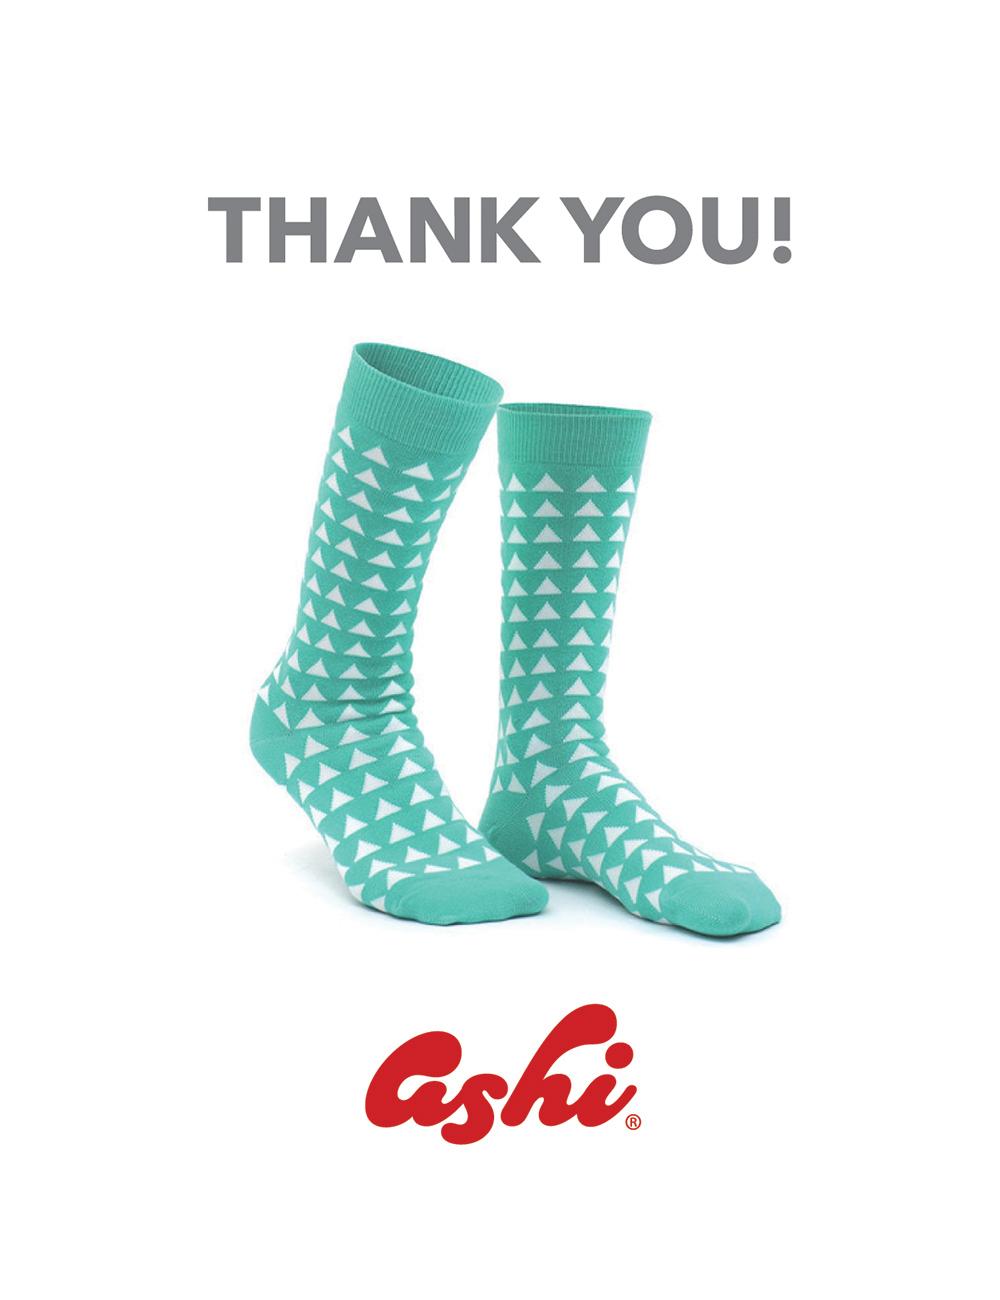 ashidashi_thank you.jpg